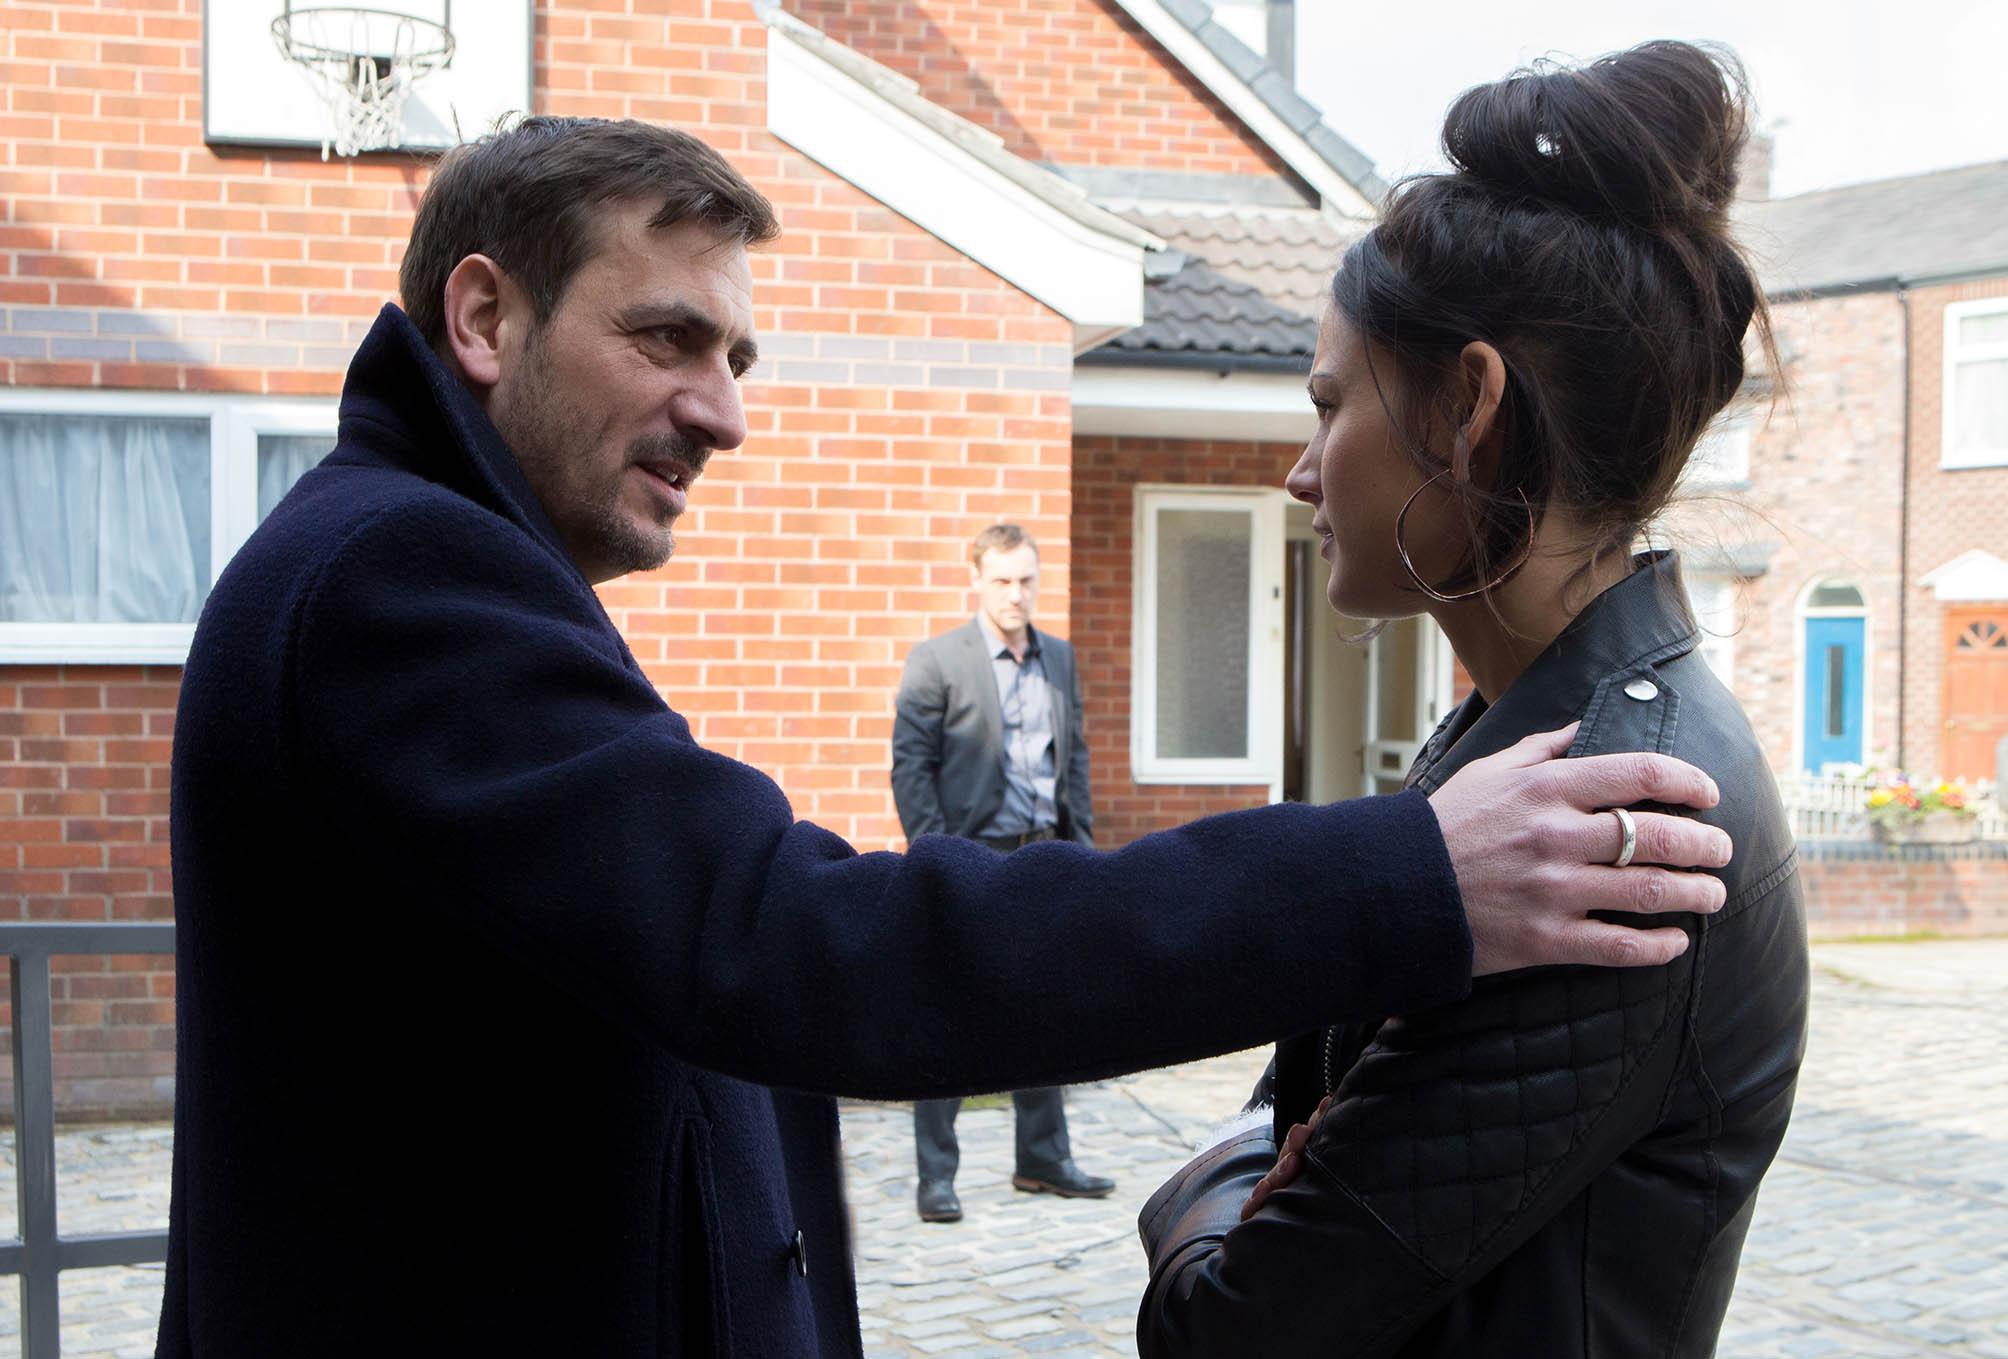 Who kills Tina McIntyre in Coronation Street? Angry Rob Donovan watches on as Peter Barlow cosies up to Tina